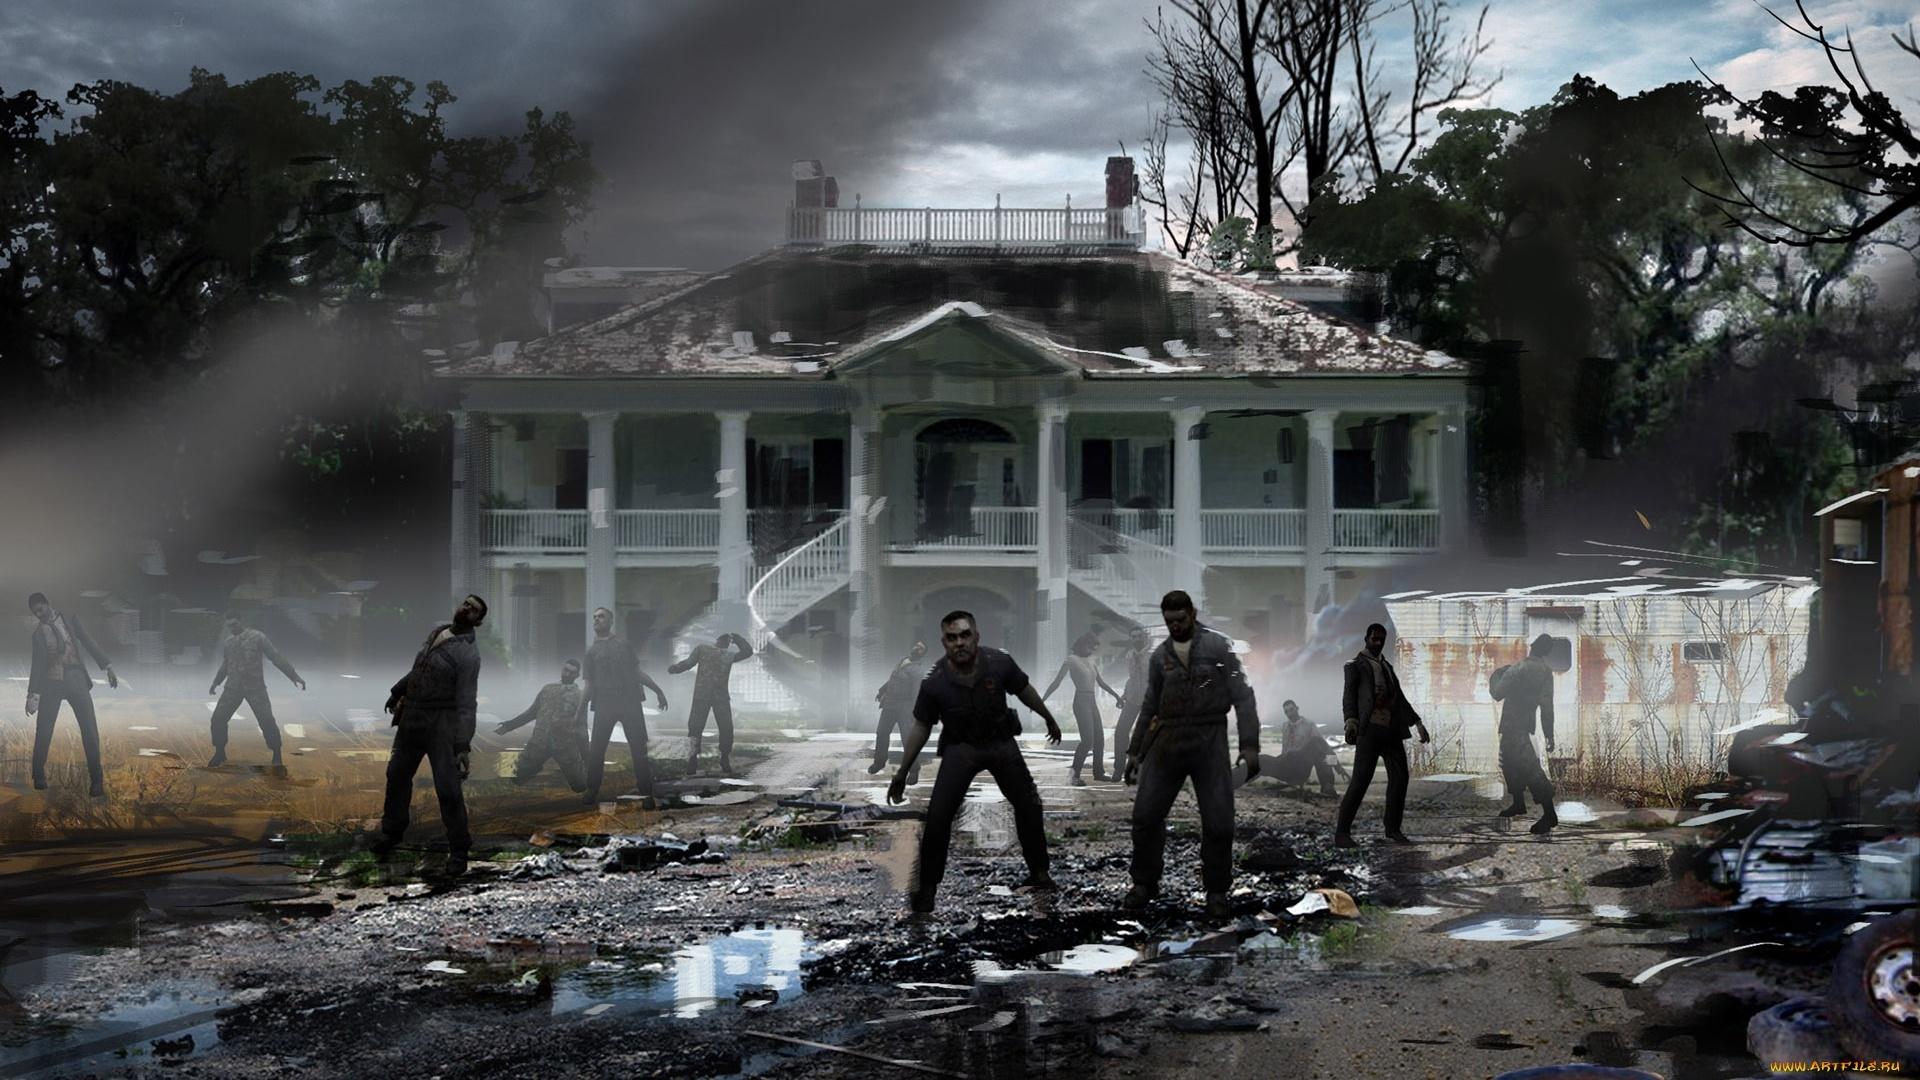 Zombie background wallpaper